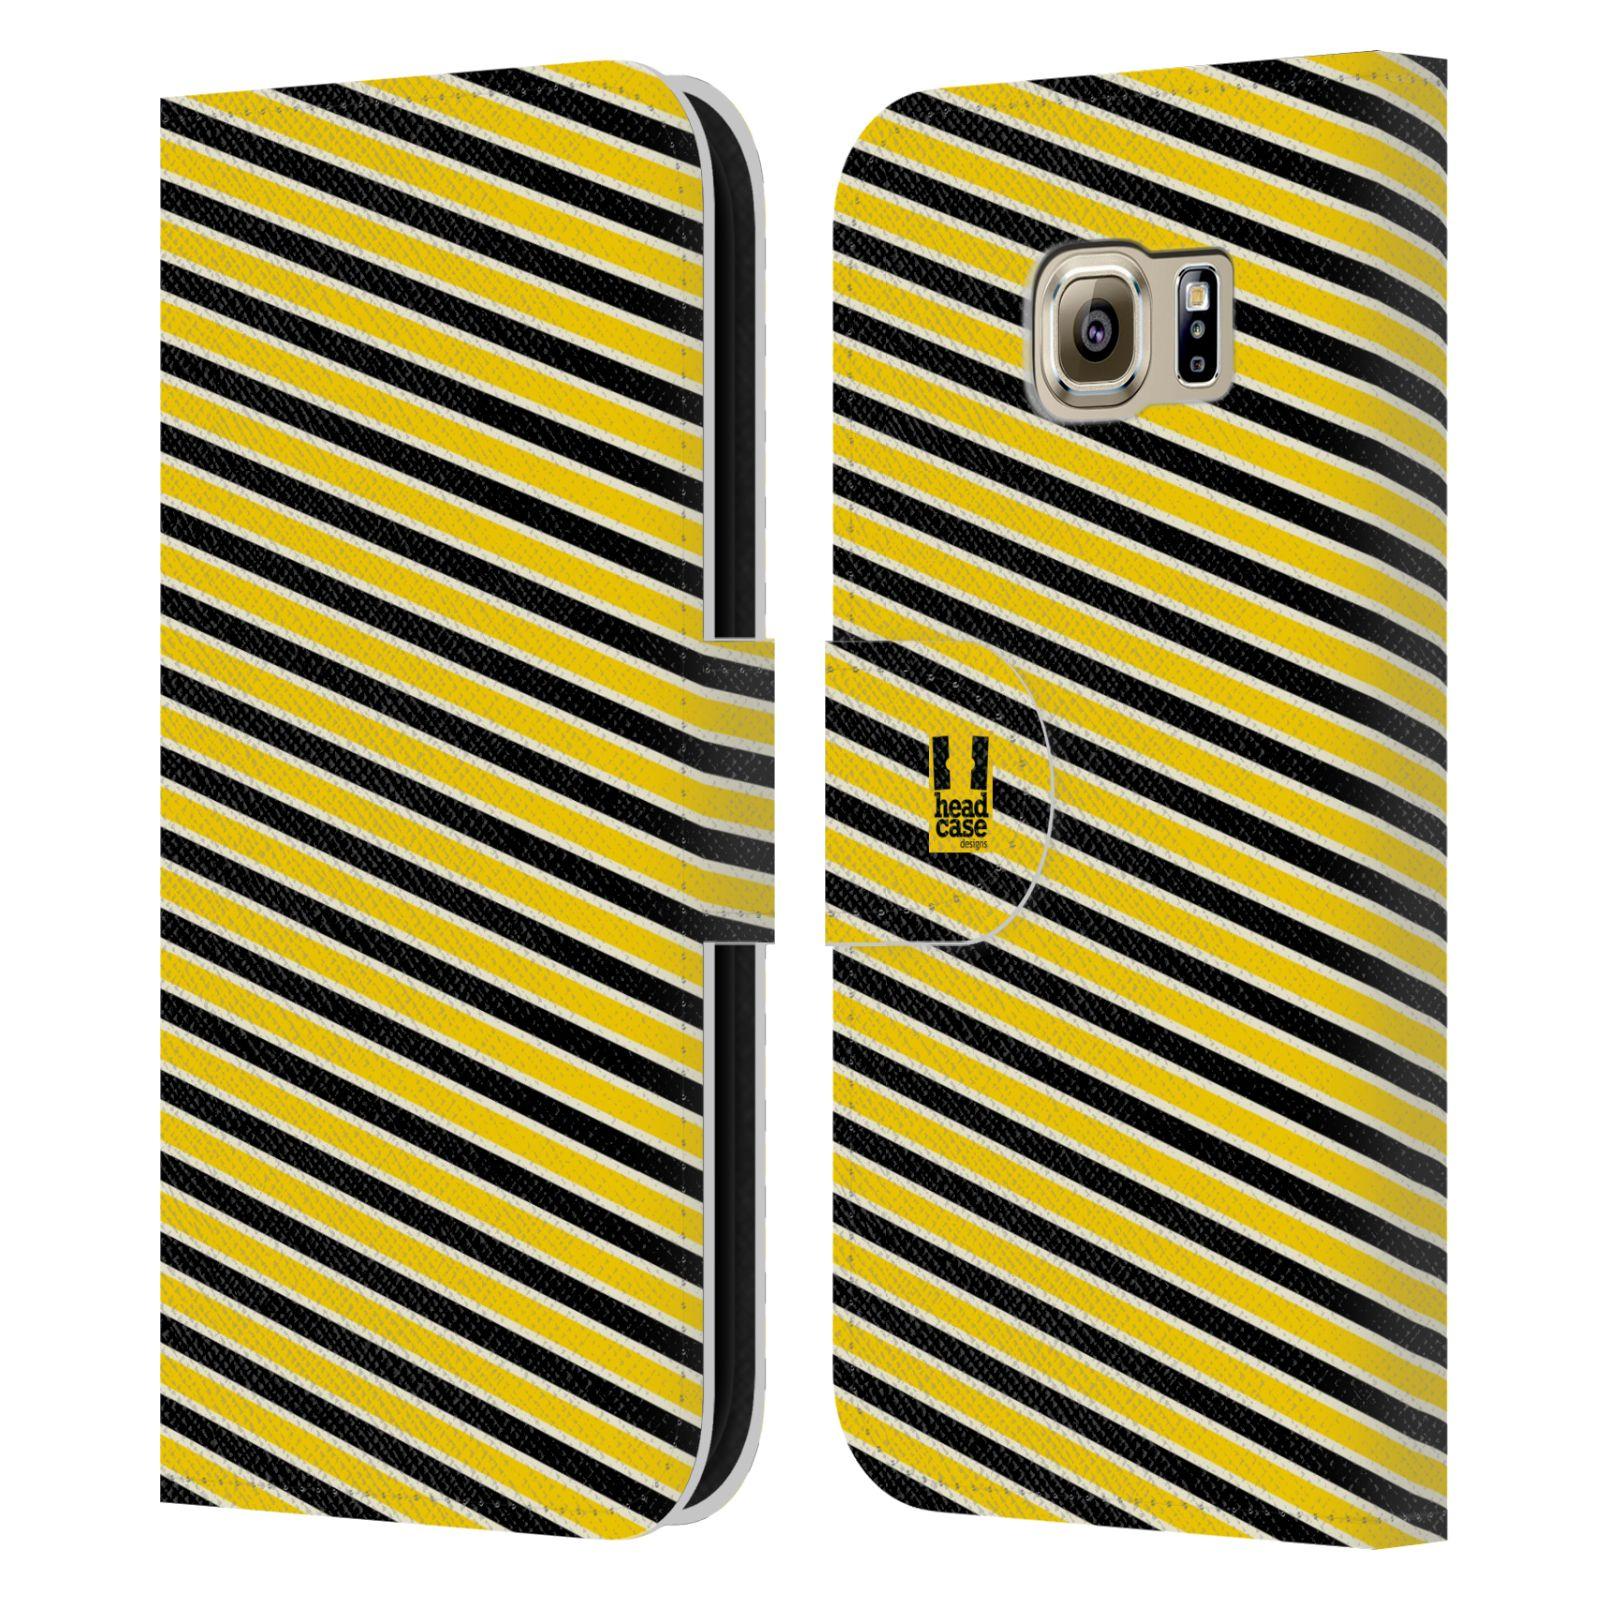 HEAD CASE Flipové pouzdro pro mobil Samsung Galaxy S6 (G9200) VČELÍ VZOR pruhy žlutá a černá